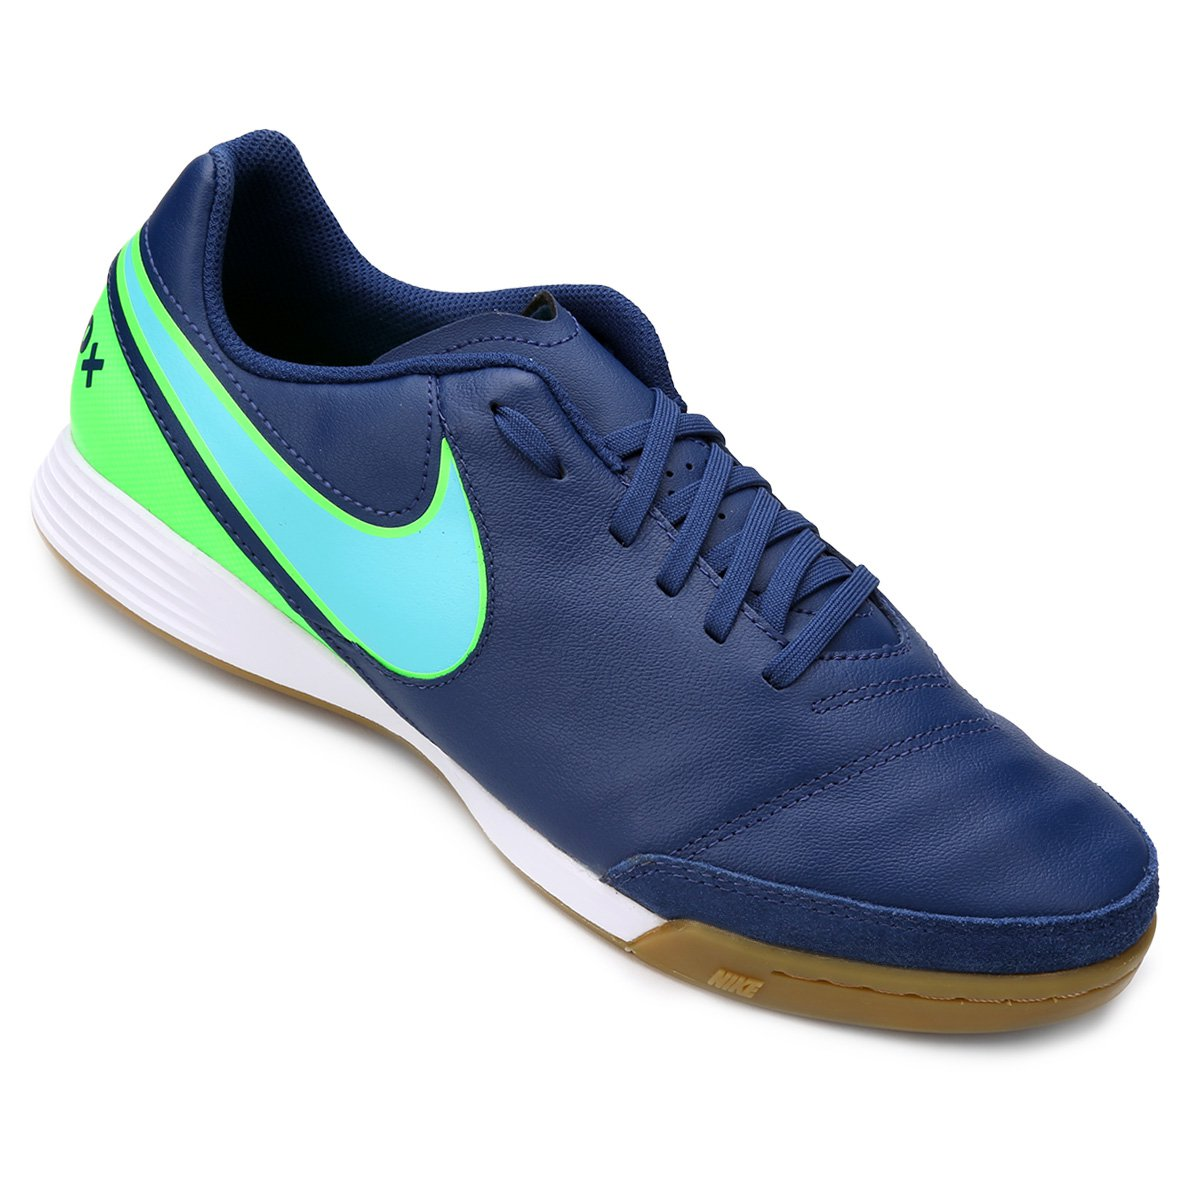 Nike Tiempo 2017 Futsal Costume Mariage Tiempox Genio Ii Leather Ic Shoes Hitam